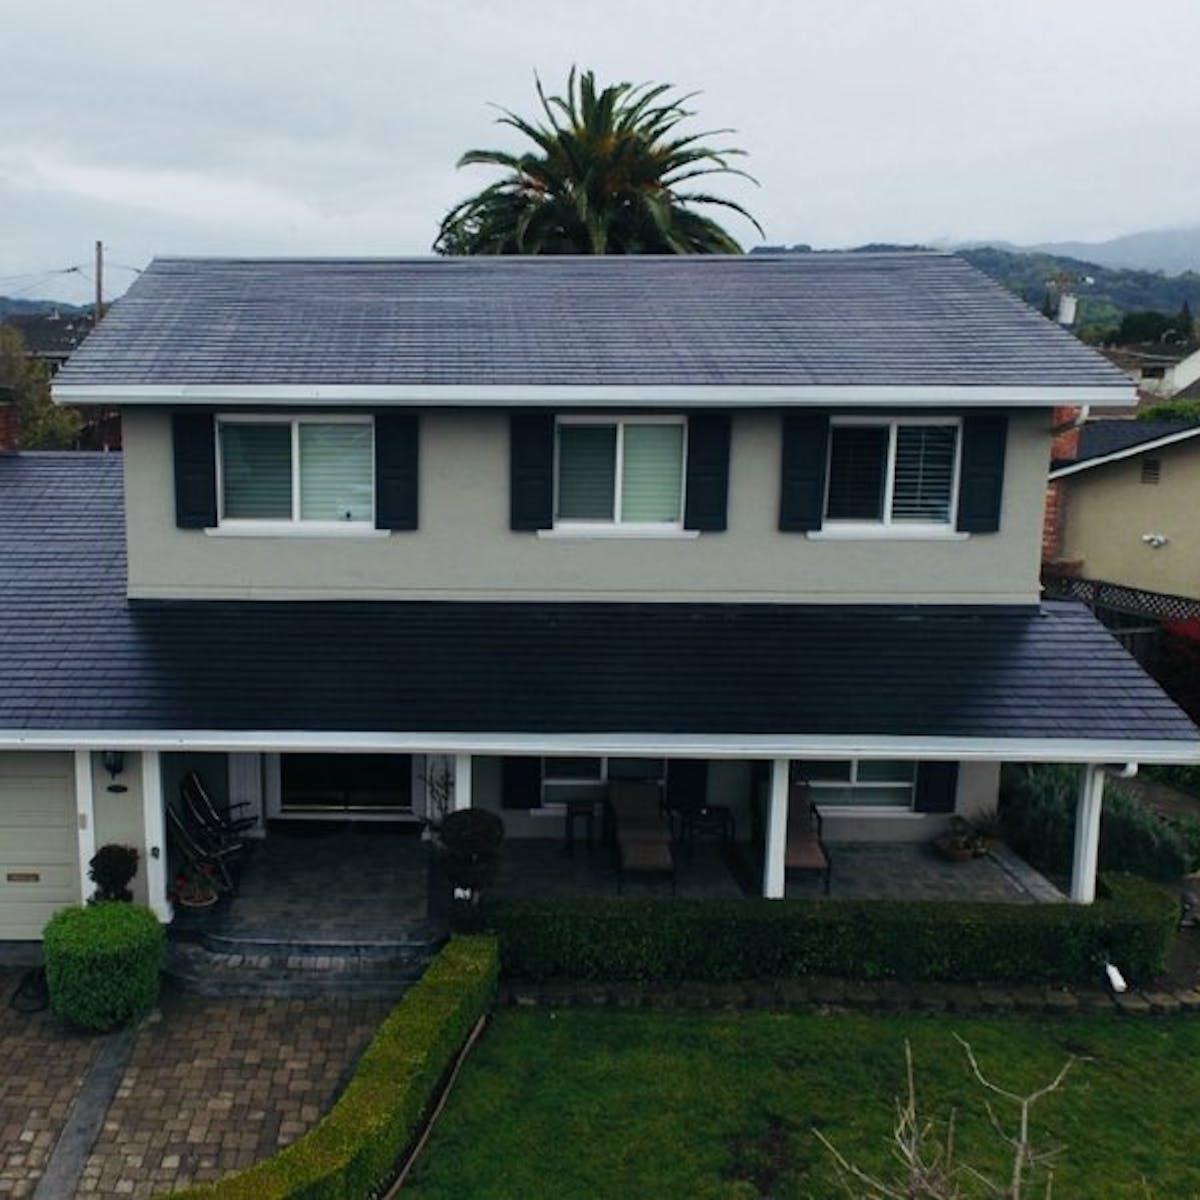 Tesla Solar Roof: Buyer Tells Us First Impressions of Elon Musk's Tiles